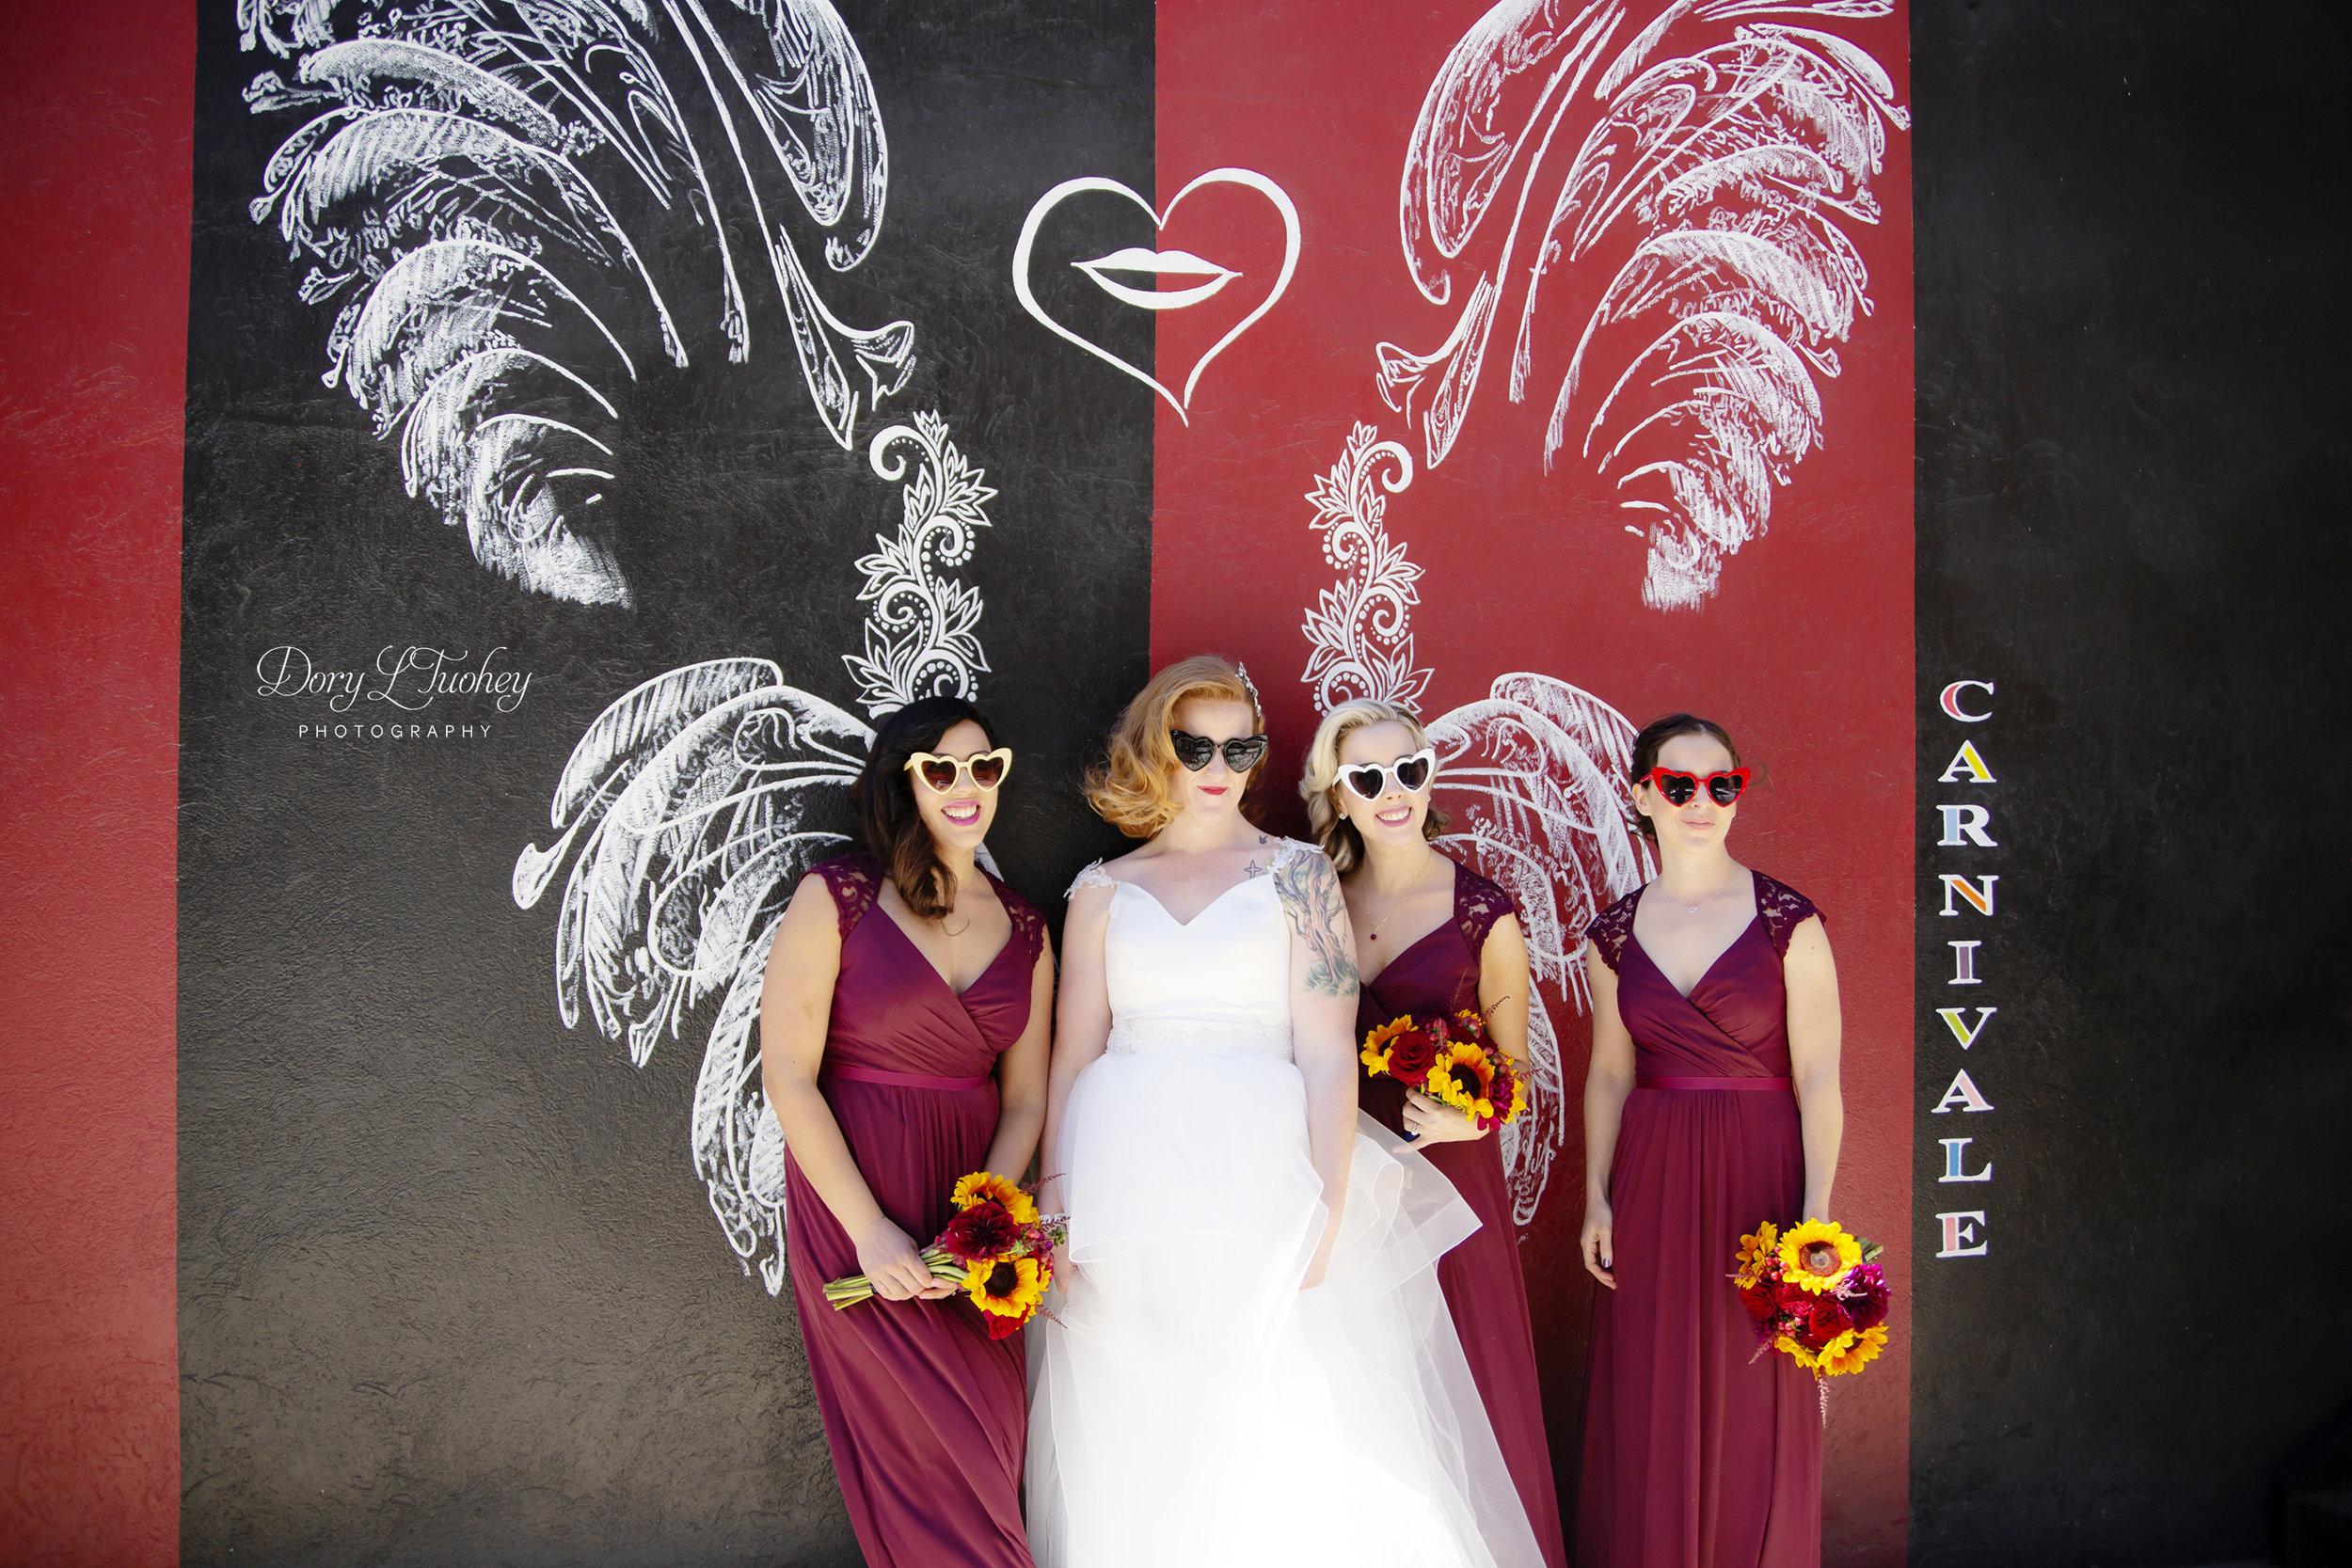 Carnivale_chicago_dory_wedding_vintage_bride_red_lips_paint_mural_groom_08.jpg